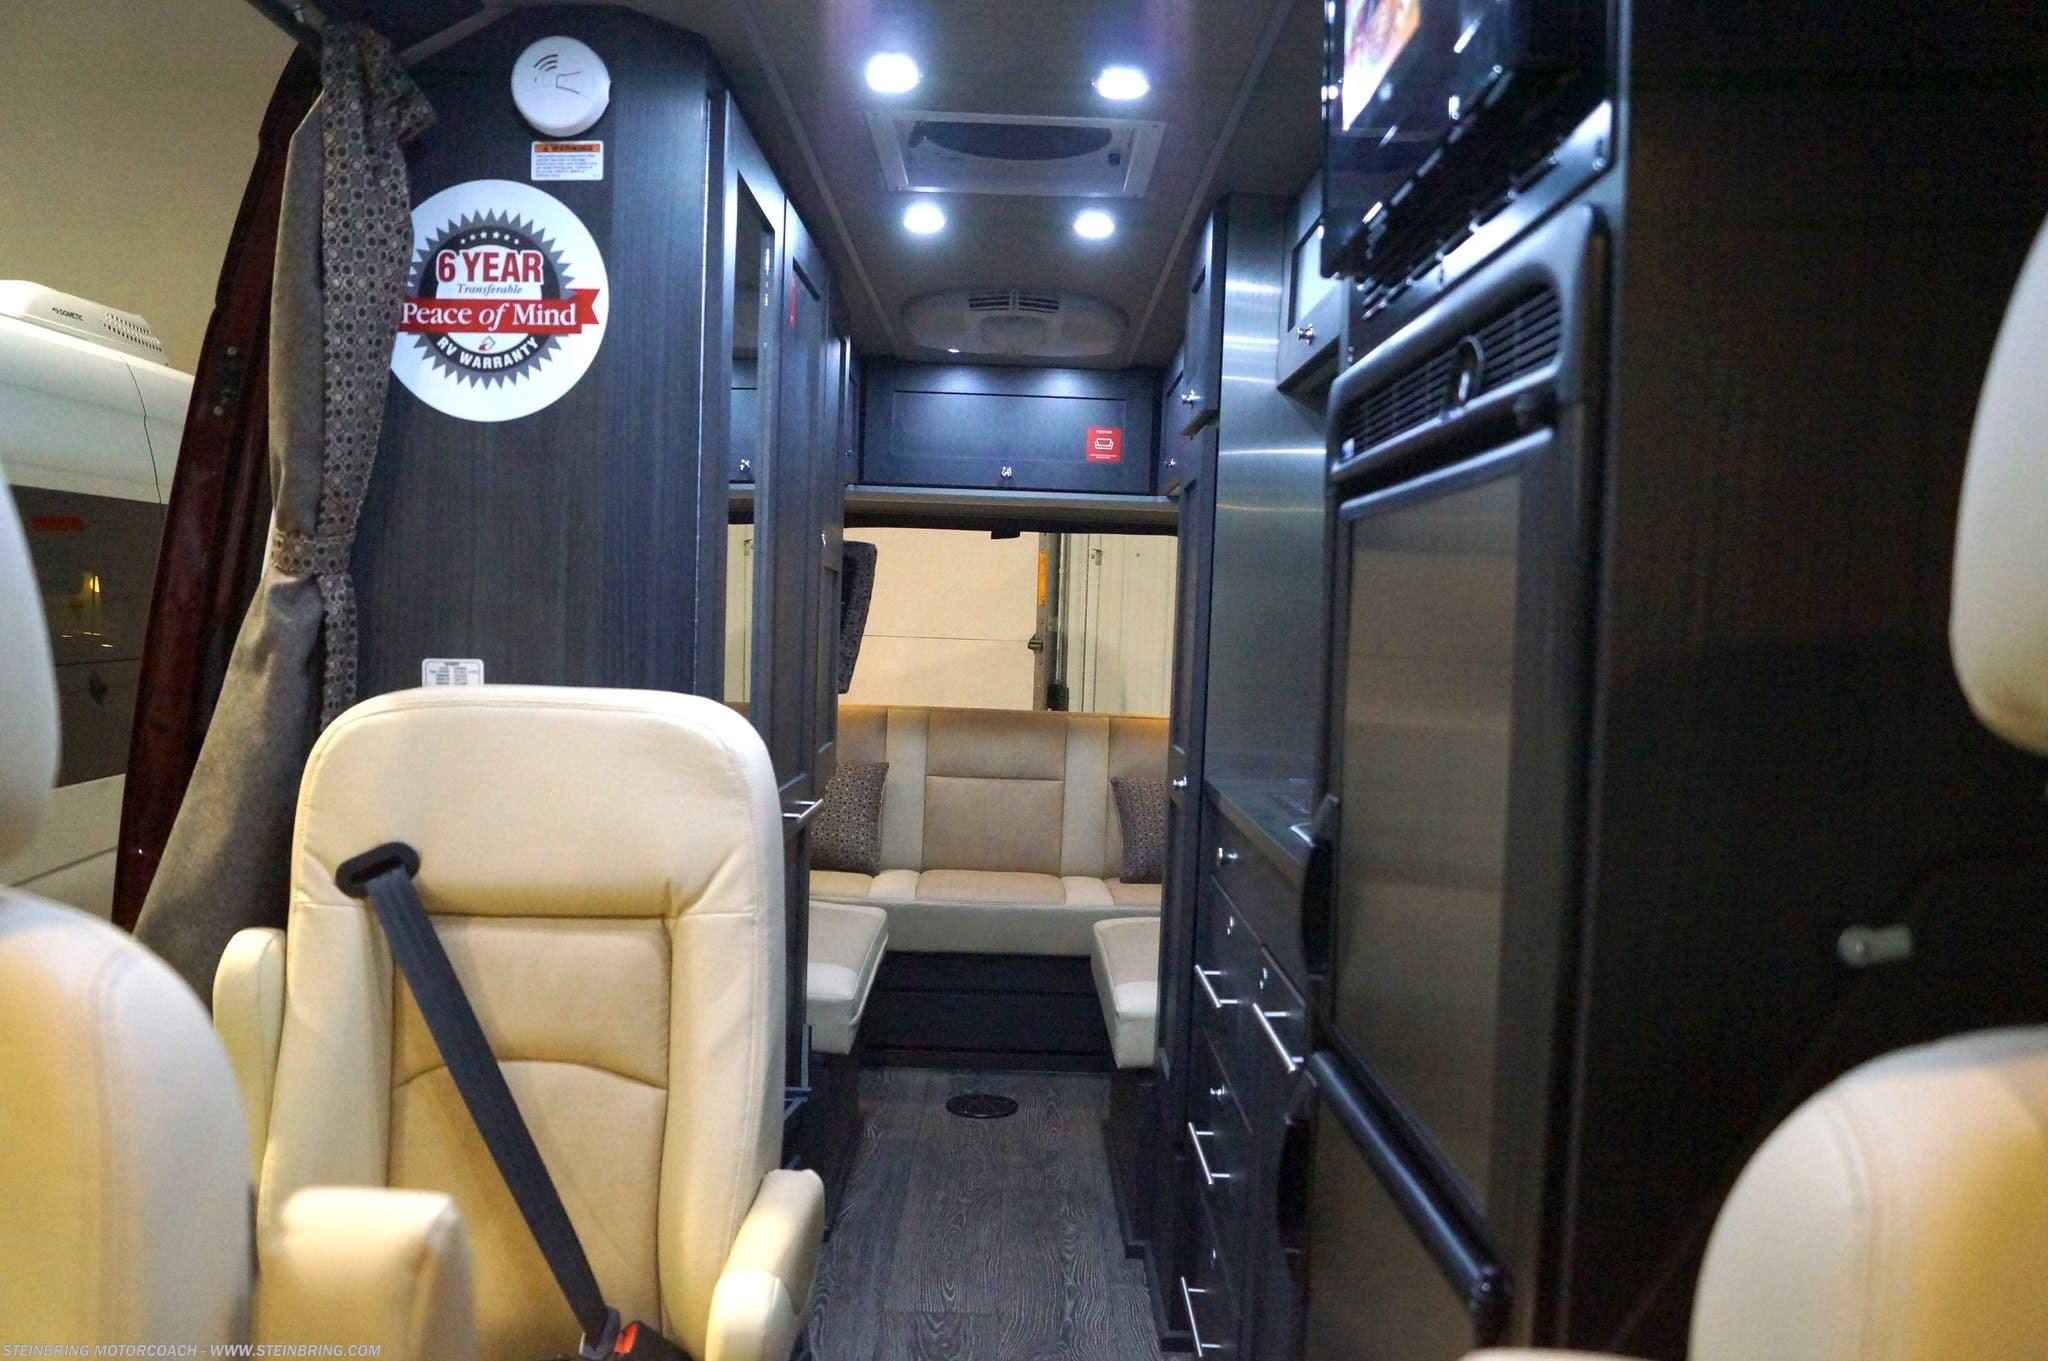 2018 Roadtrek RV CS-Adventurous REDUCED! YEAR END SALE! SAVE! for Sale in  Garfield, MN 56332 | R18-008-105395